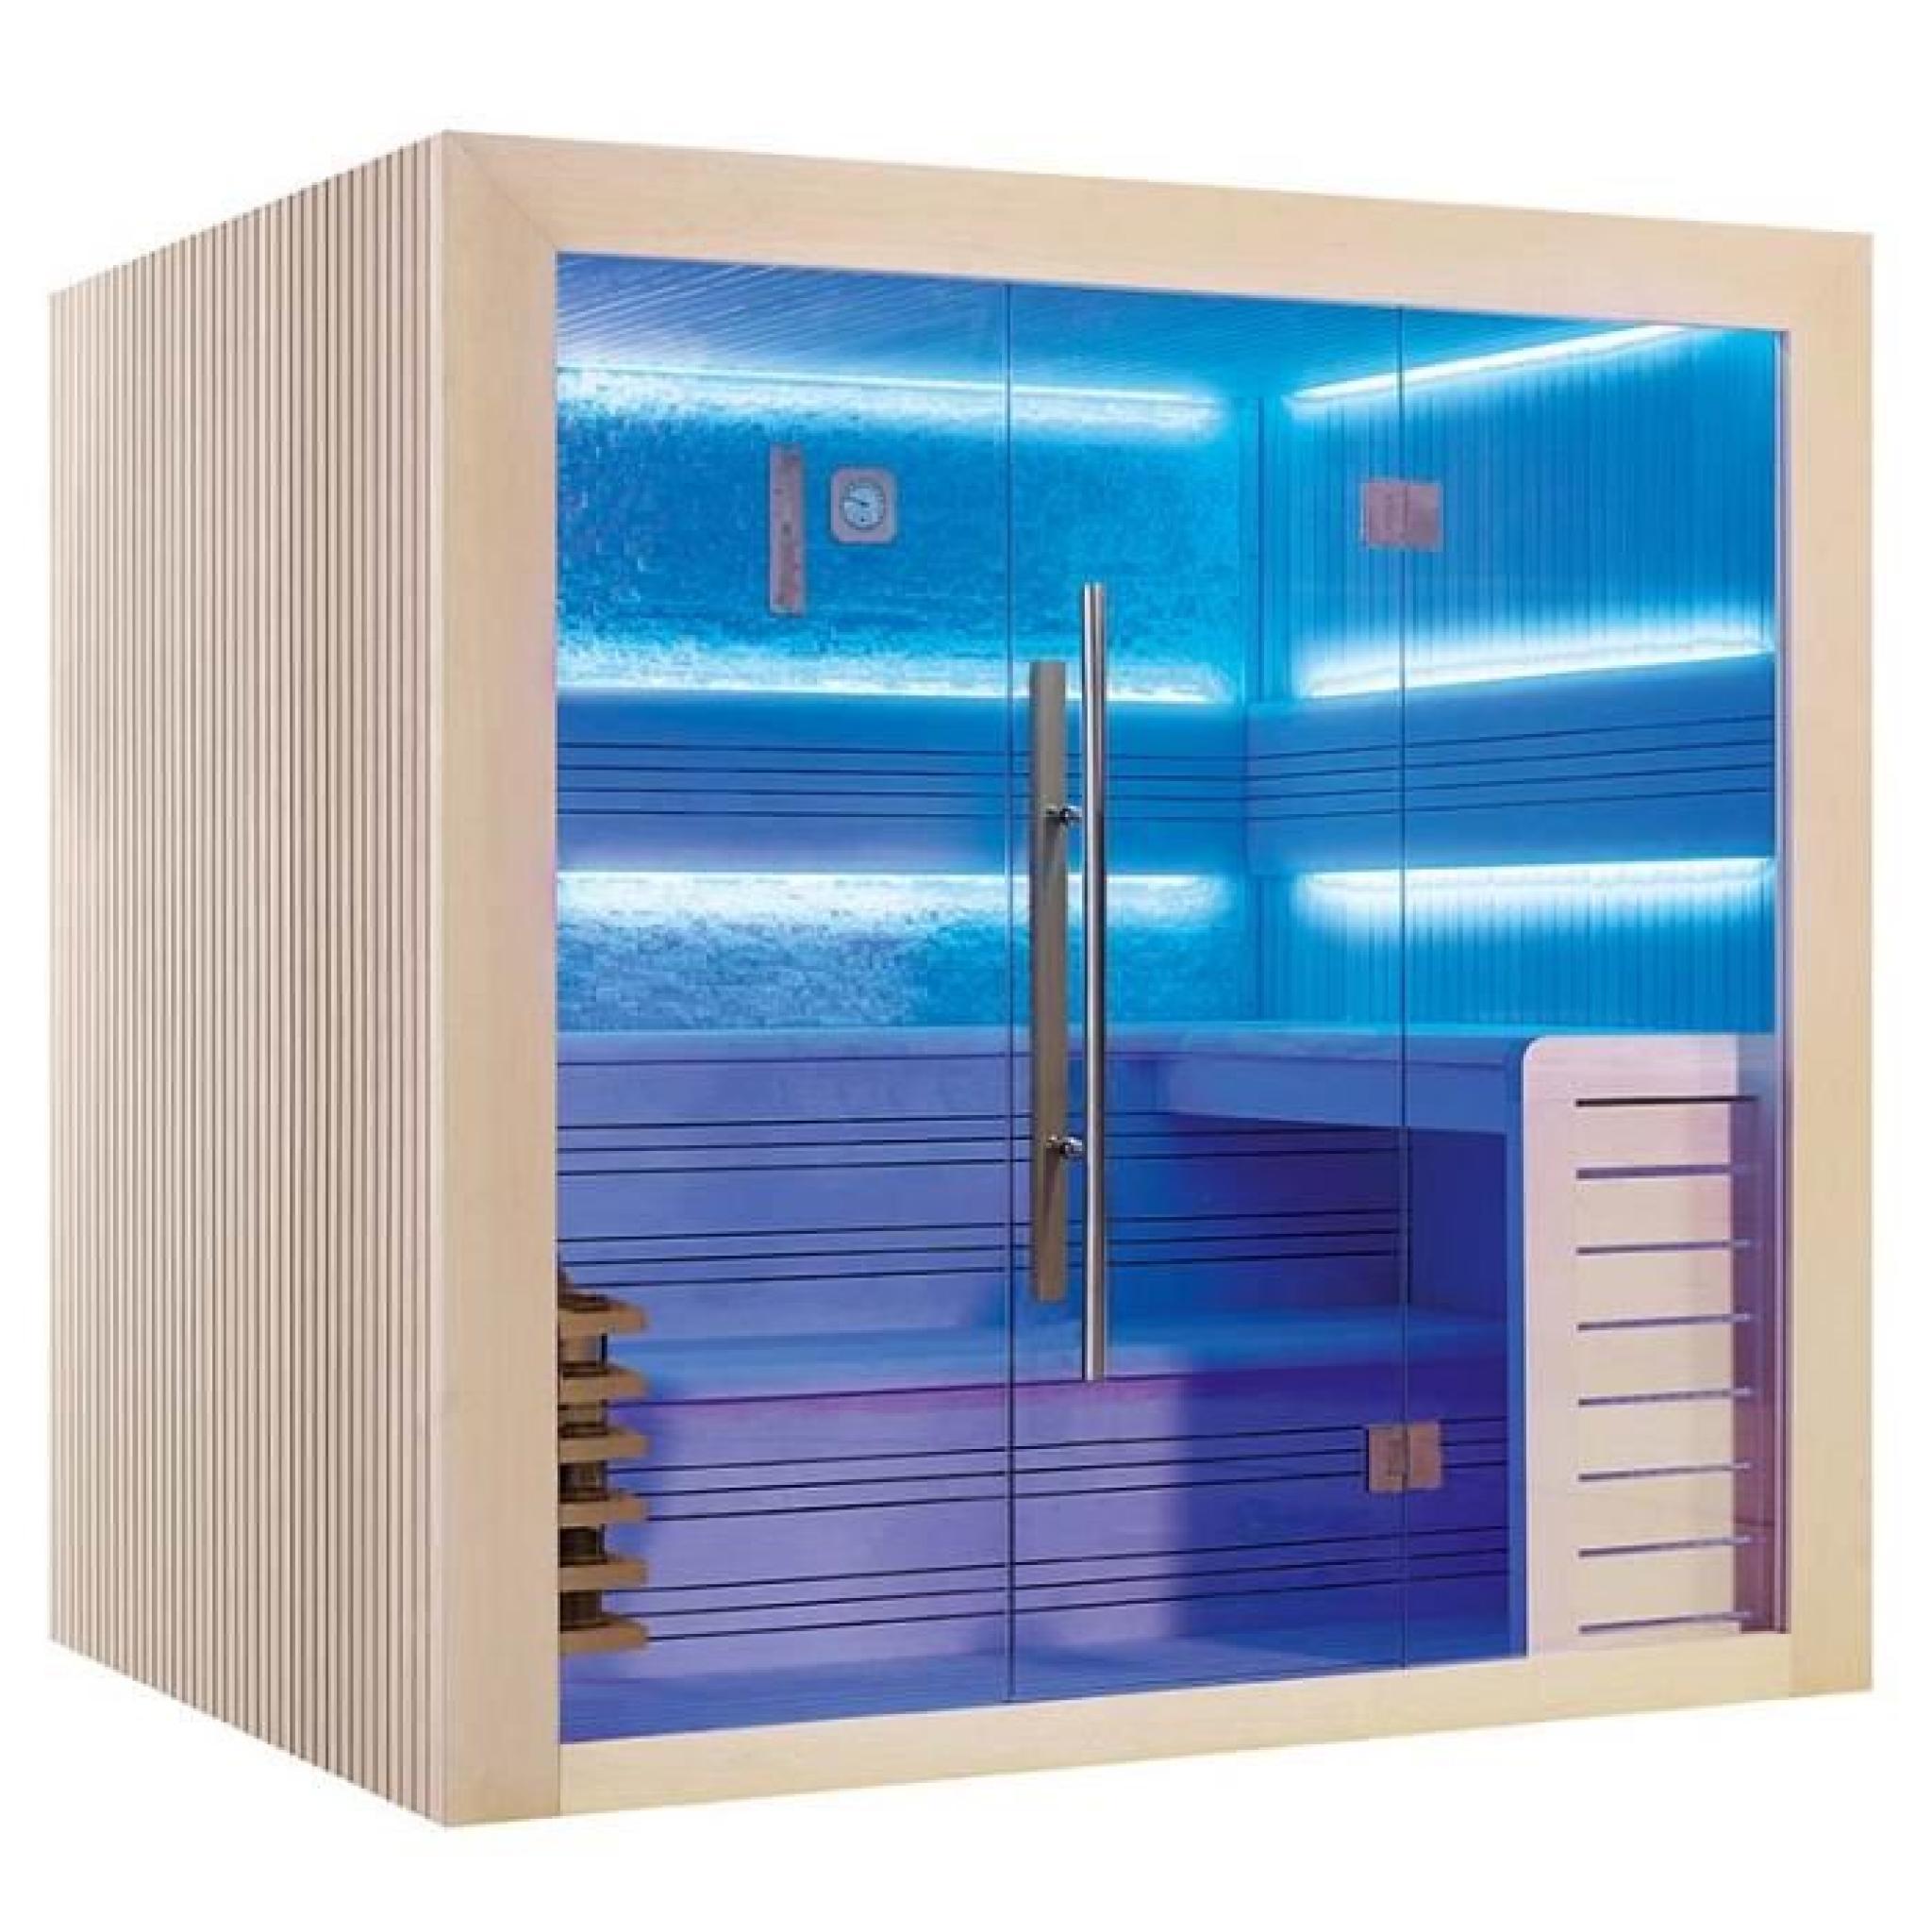 sauna traditionnels dallas 220 x 170 x 210 pin blanc achat vente sauna pas cher. Black Bedroom Furniture Sets. Home Design Ideas